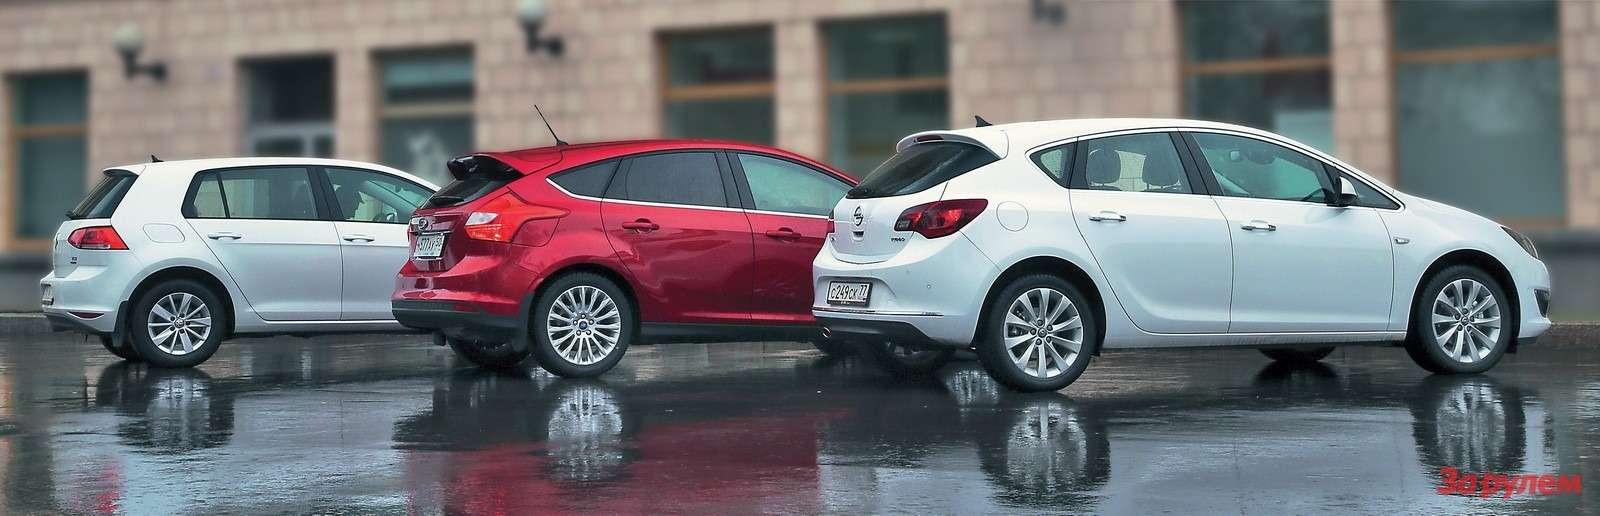 VWGolf, Ford Focus иOpel Astra